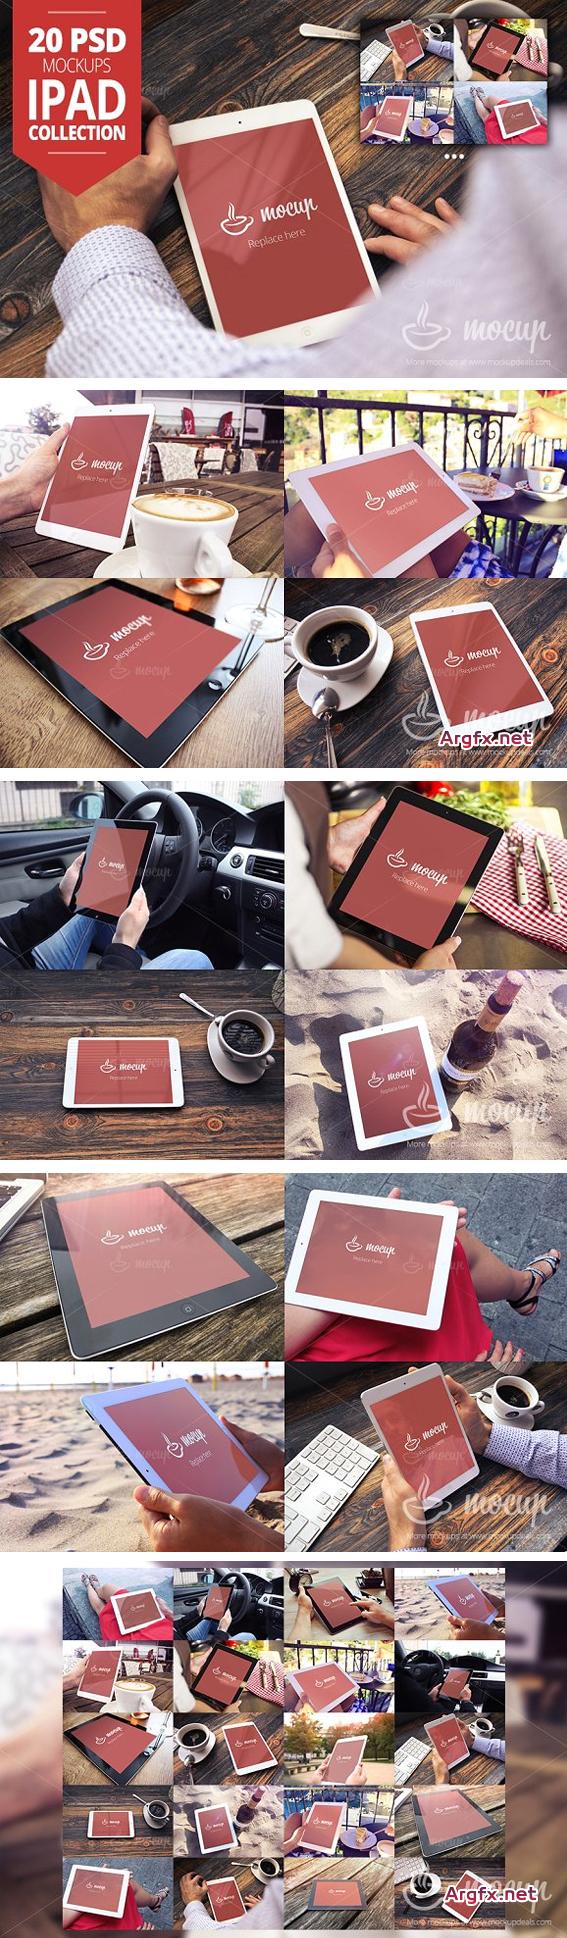 CM 223003 - 20 PSD iPad Mockup Collection